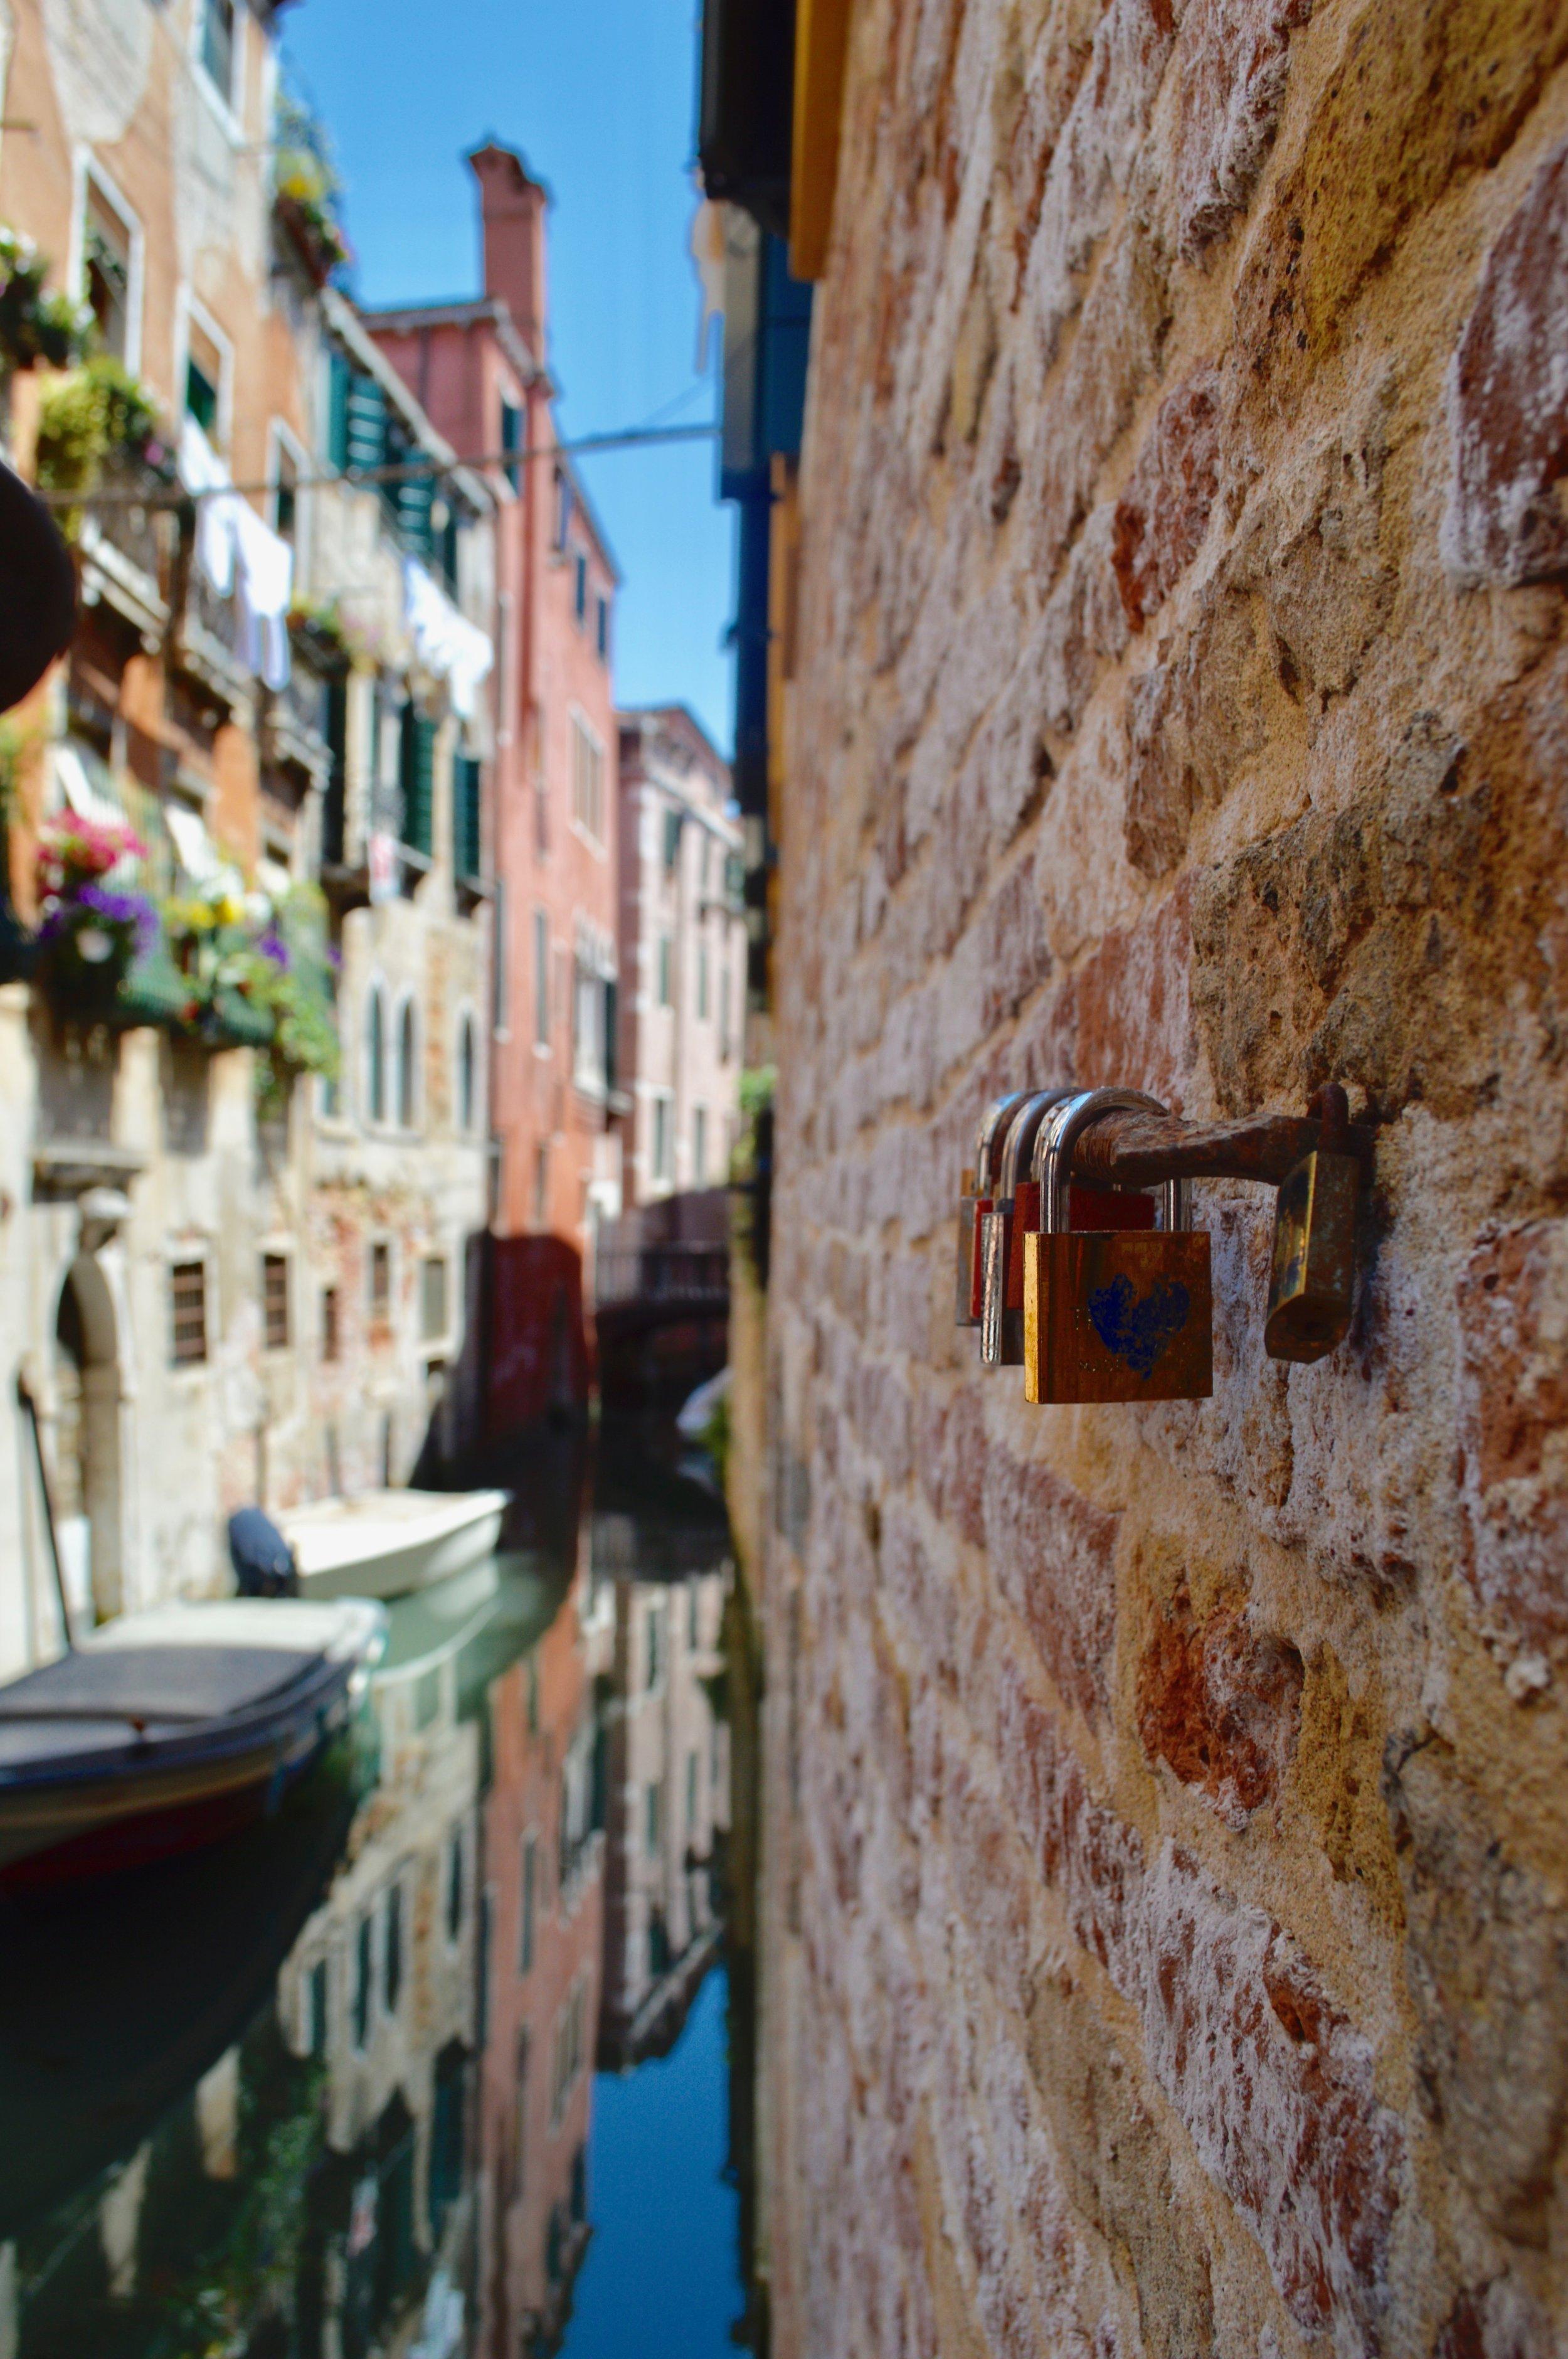 Venice_love-lock.jpg